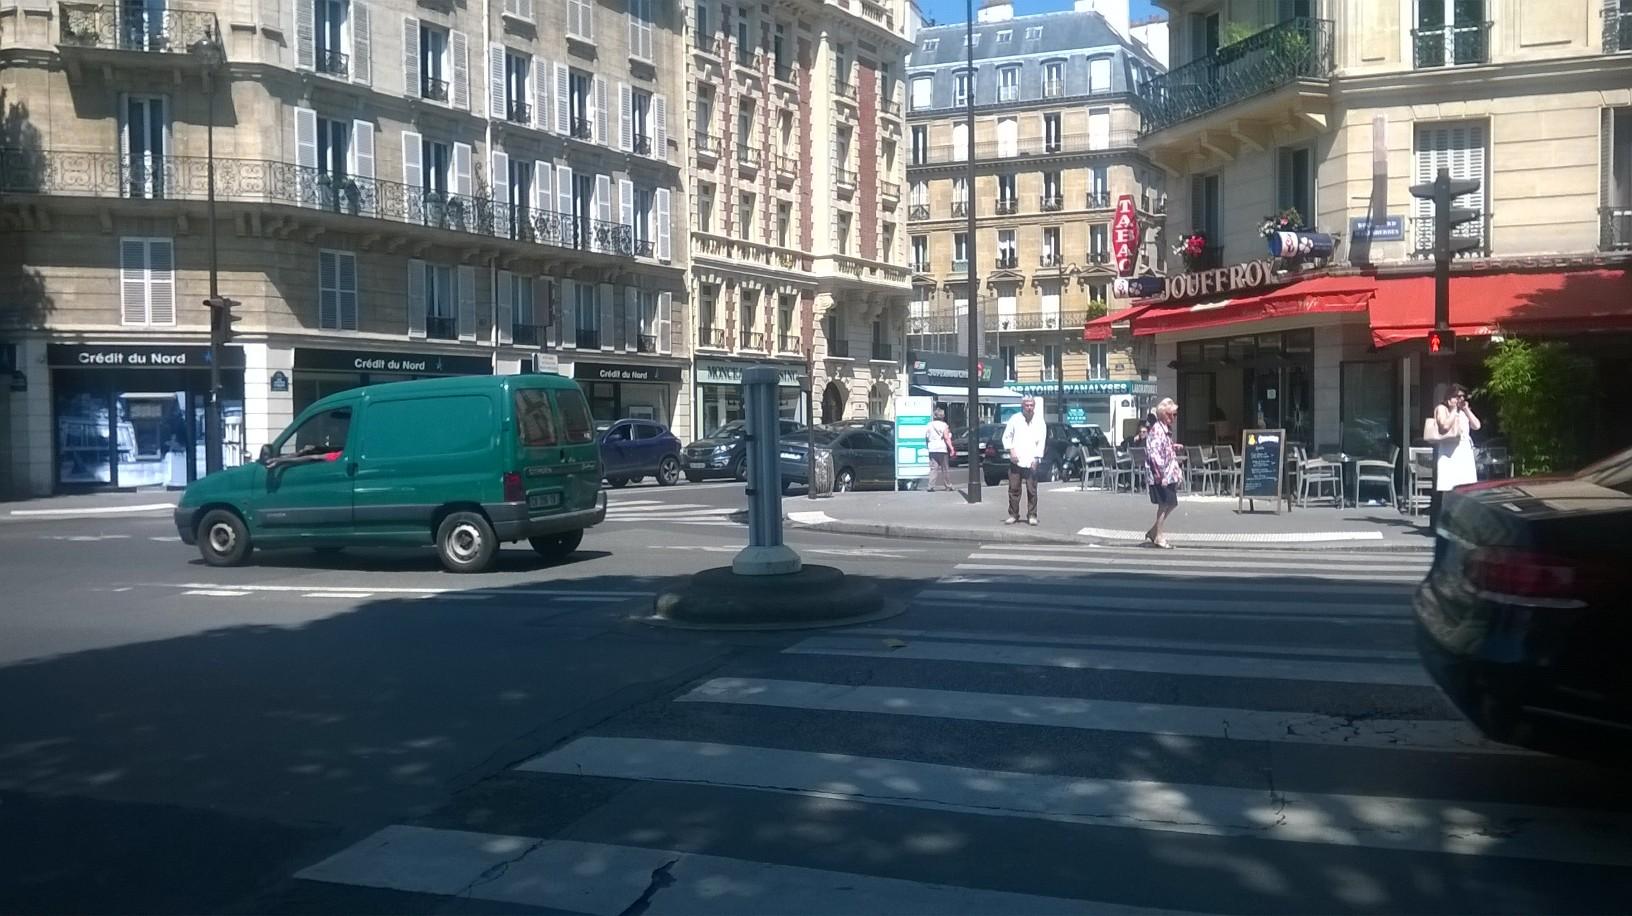 paris rue Jouffroy d'Abbans to cap hispania jul16